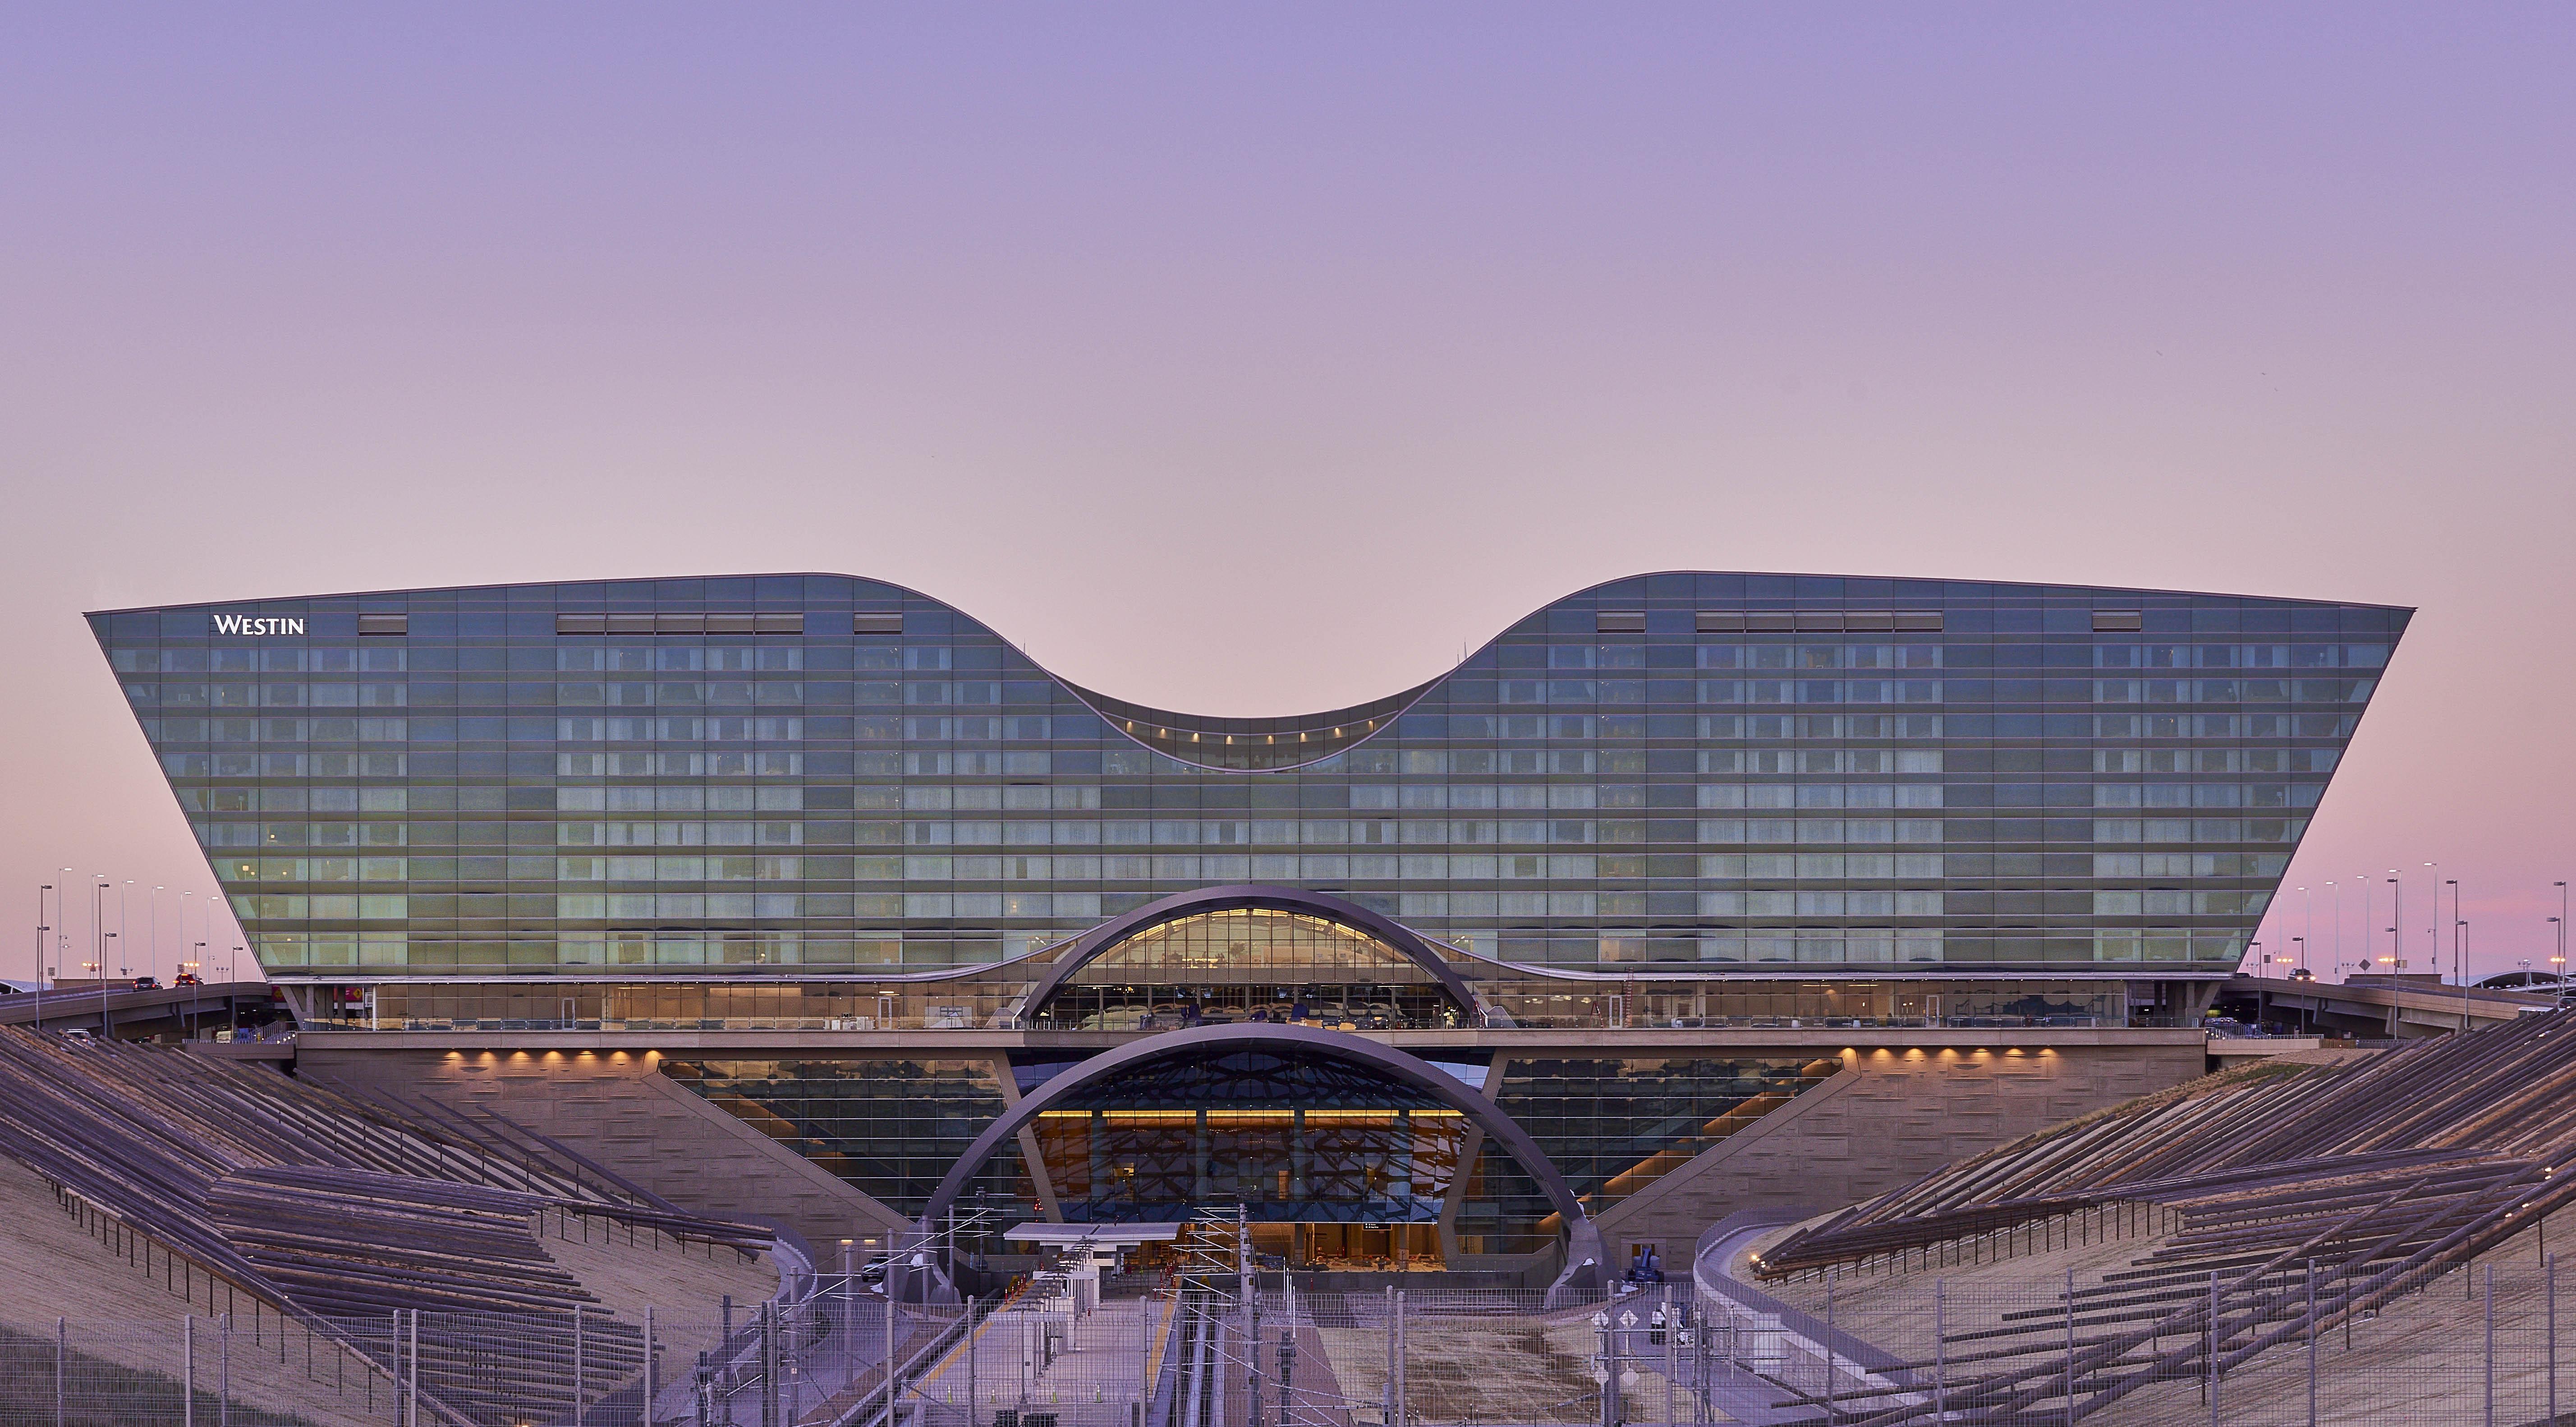 Westin Dia Hotel Earns Leed Platinum Status 2017 03 20 Enr